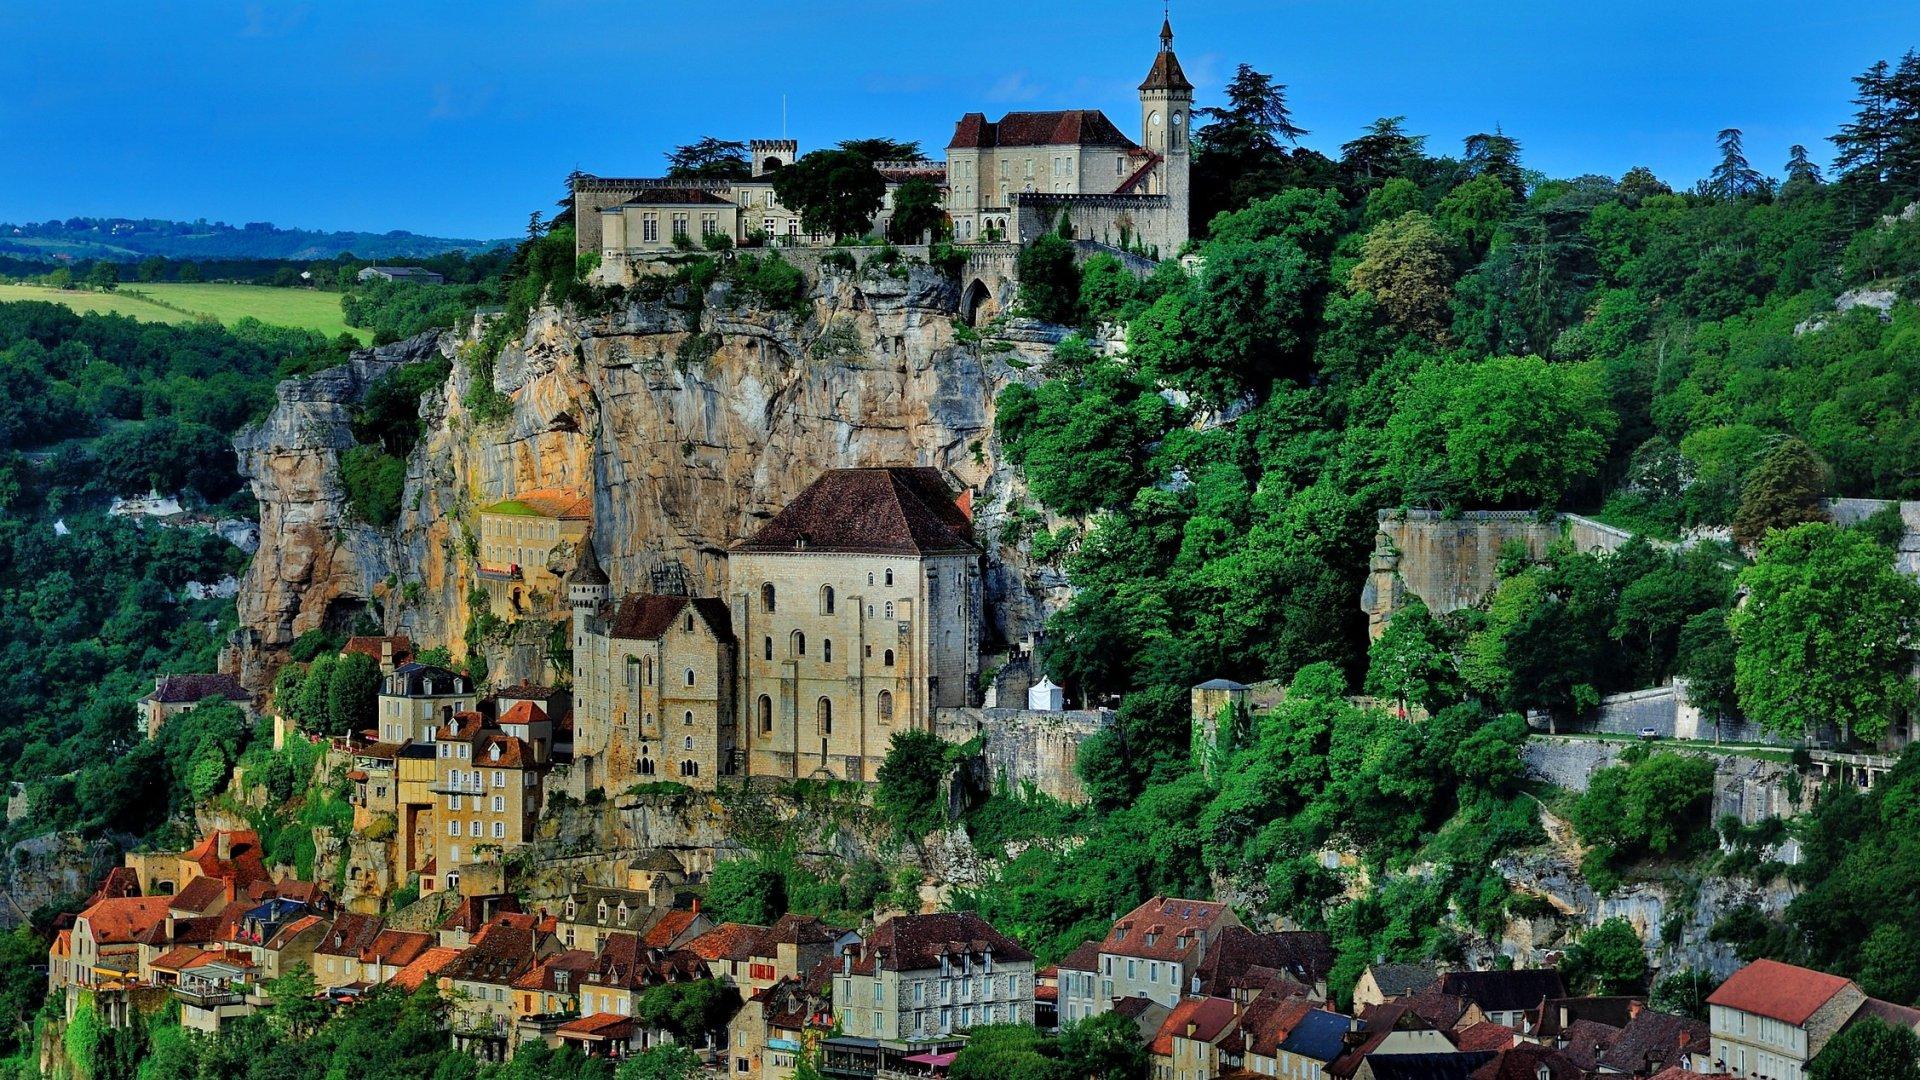 Rocamadour: City, Building, Man Made, France, House, Rocamadour, Stone